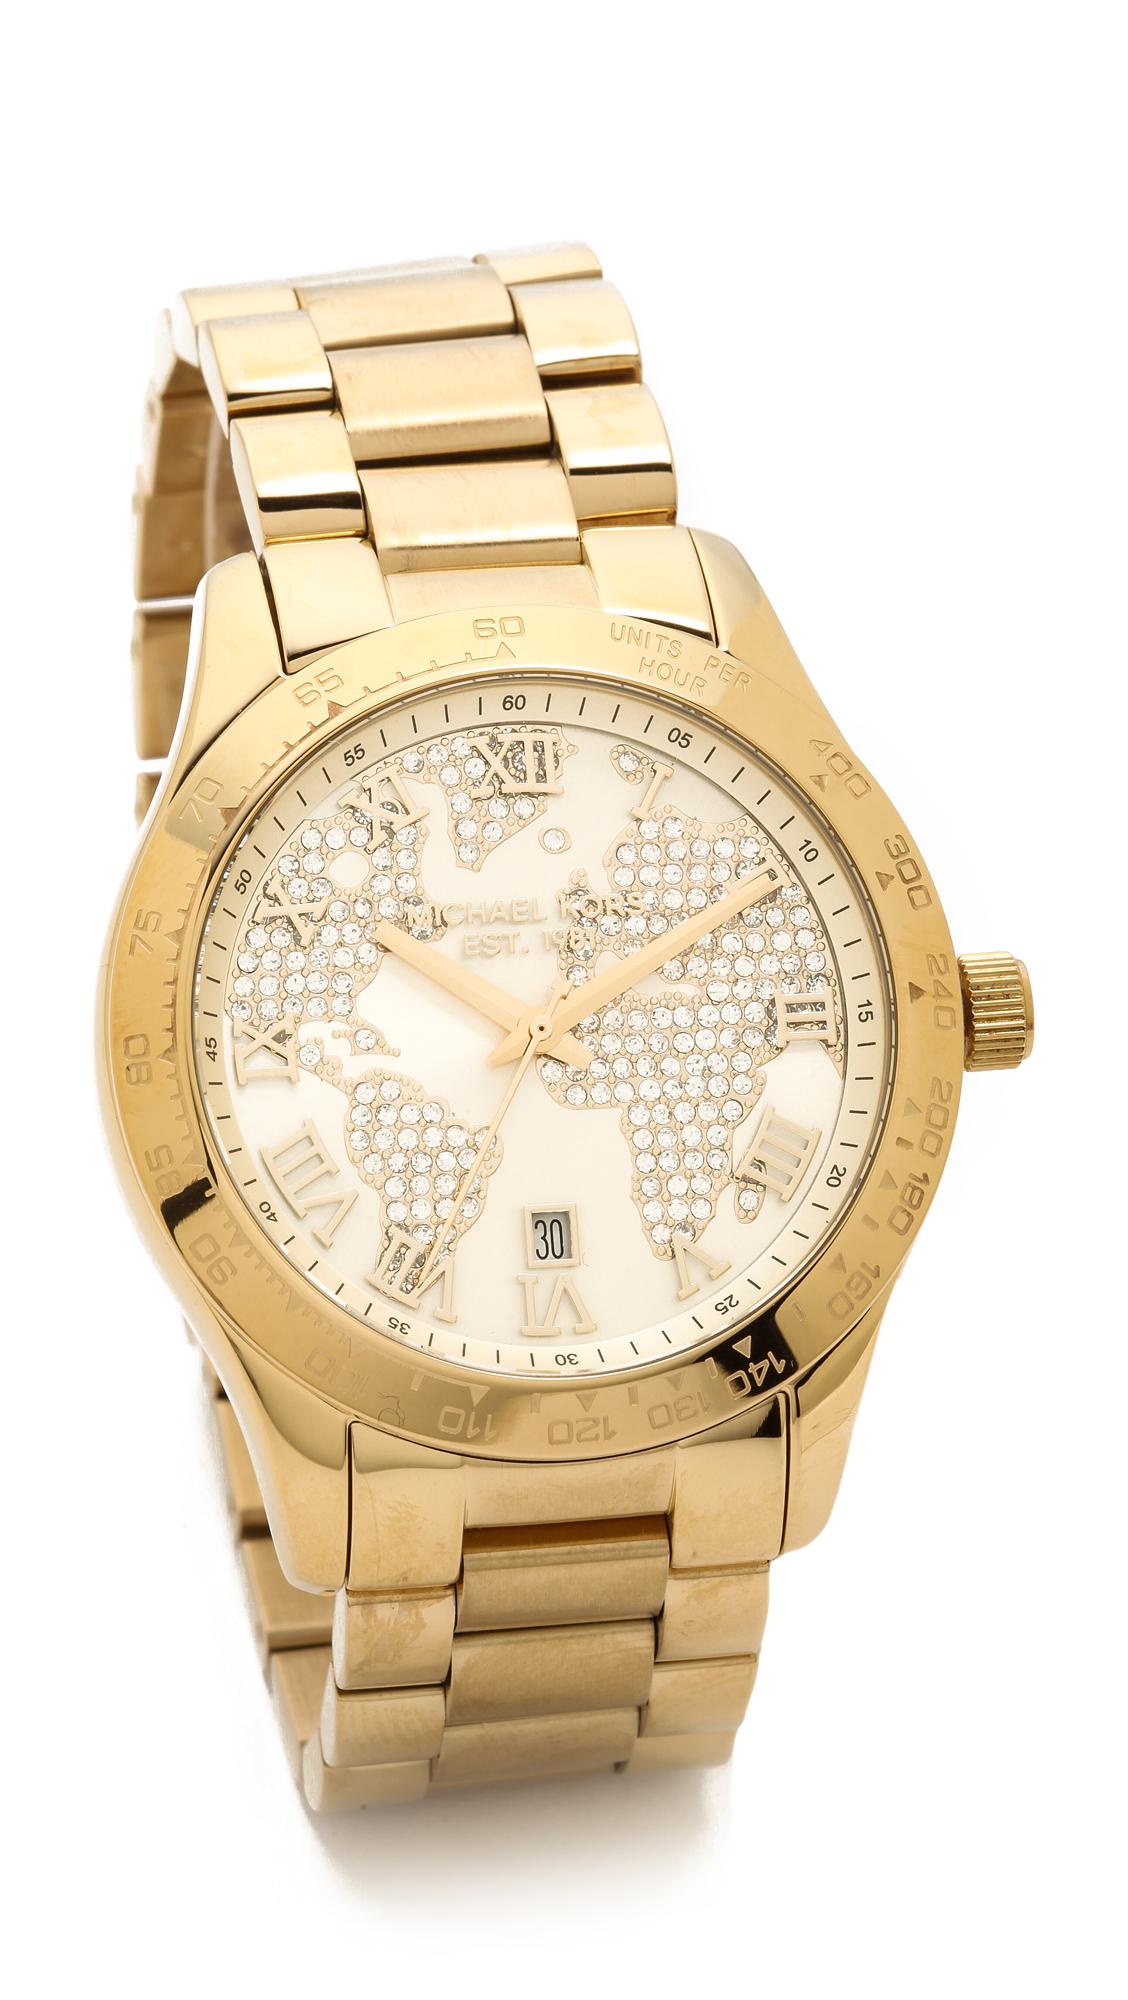 Lyst michael kors global glam layton watch gold in metallic gallery gumiabroncs Choice Image